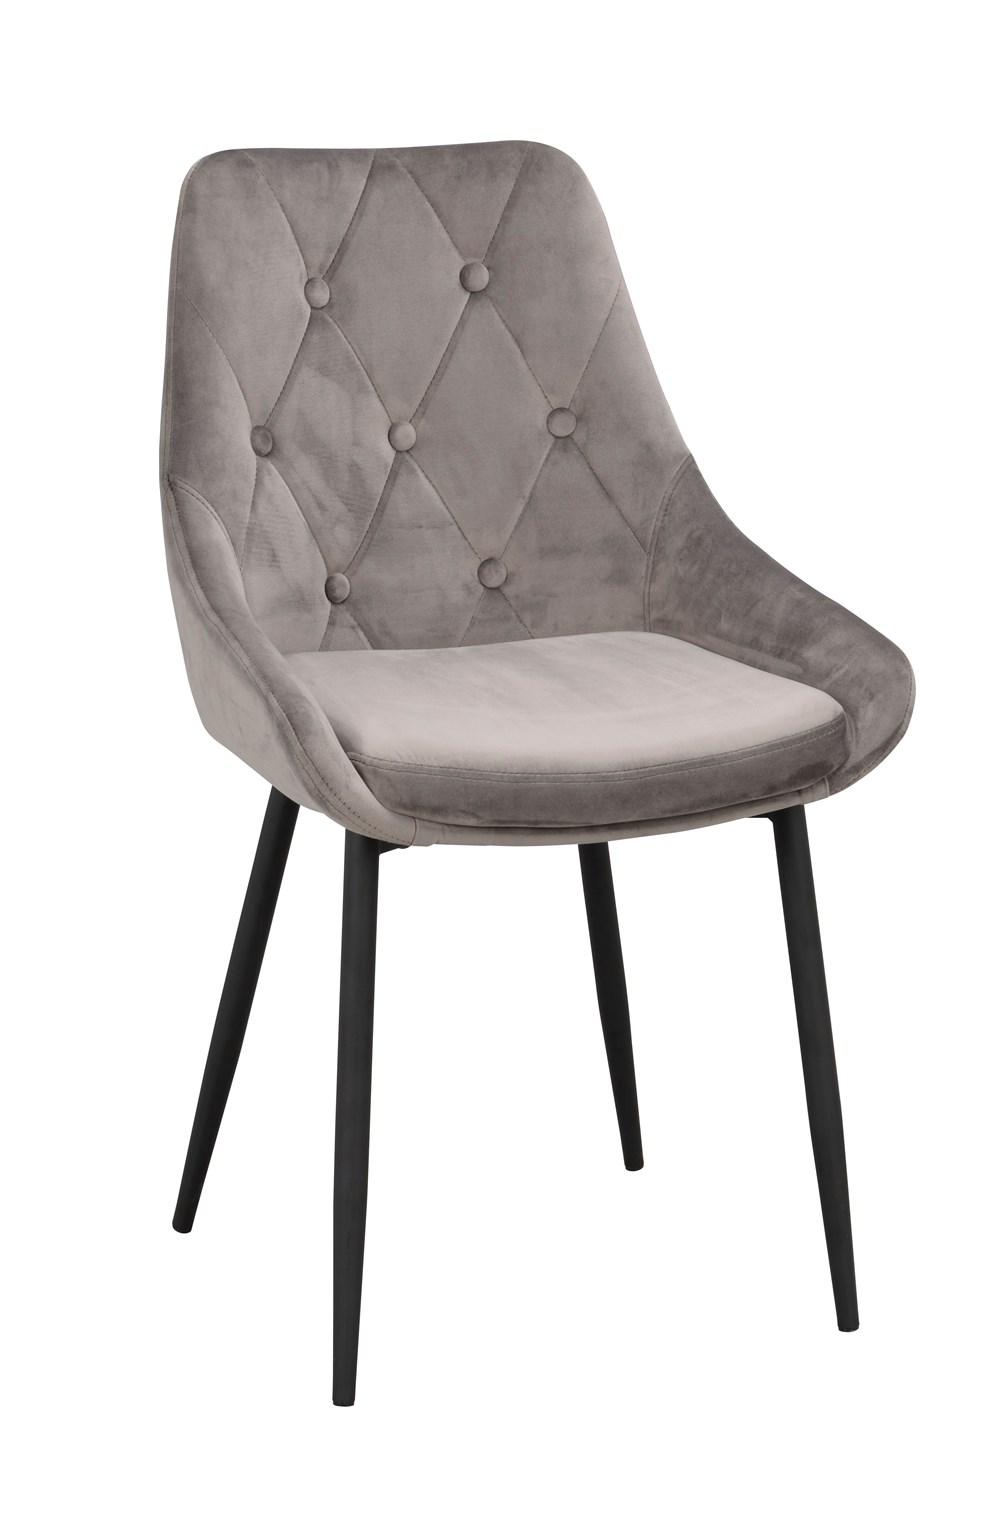 Alberton tuoli harmaa sametti/musta metalli, Rowico